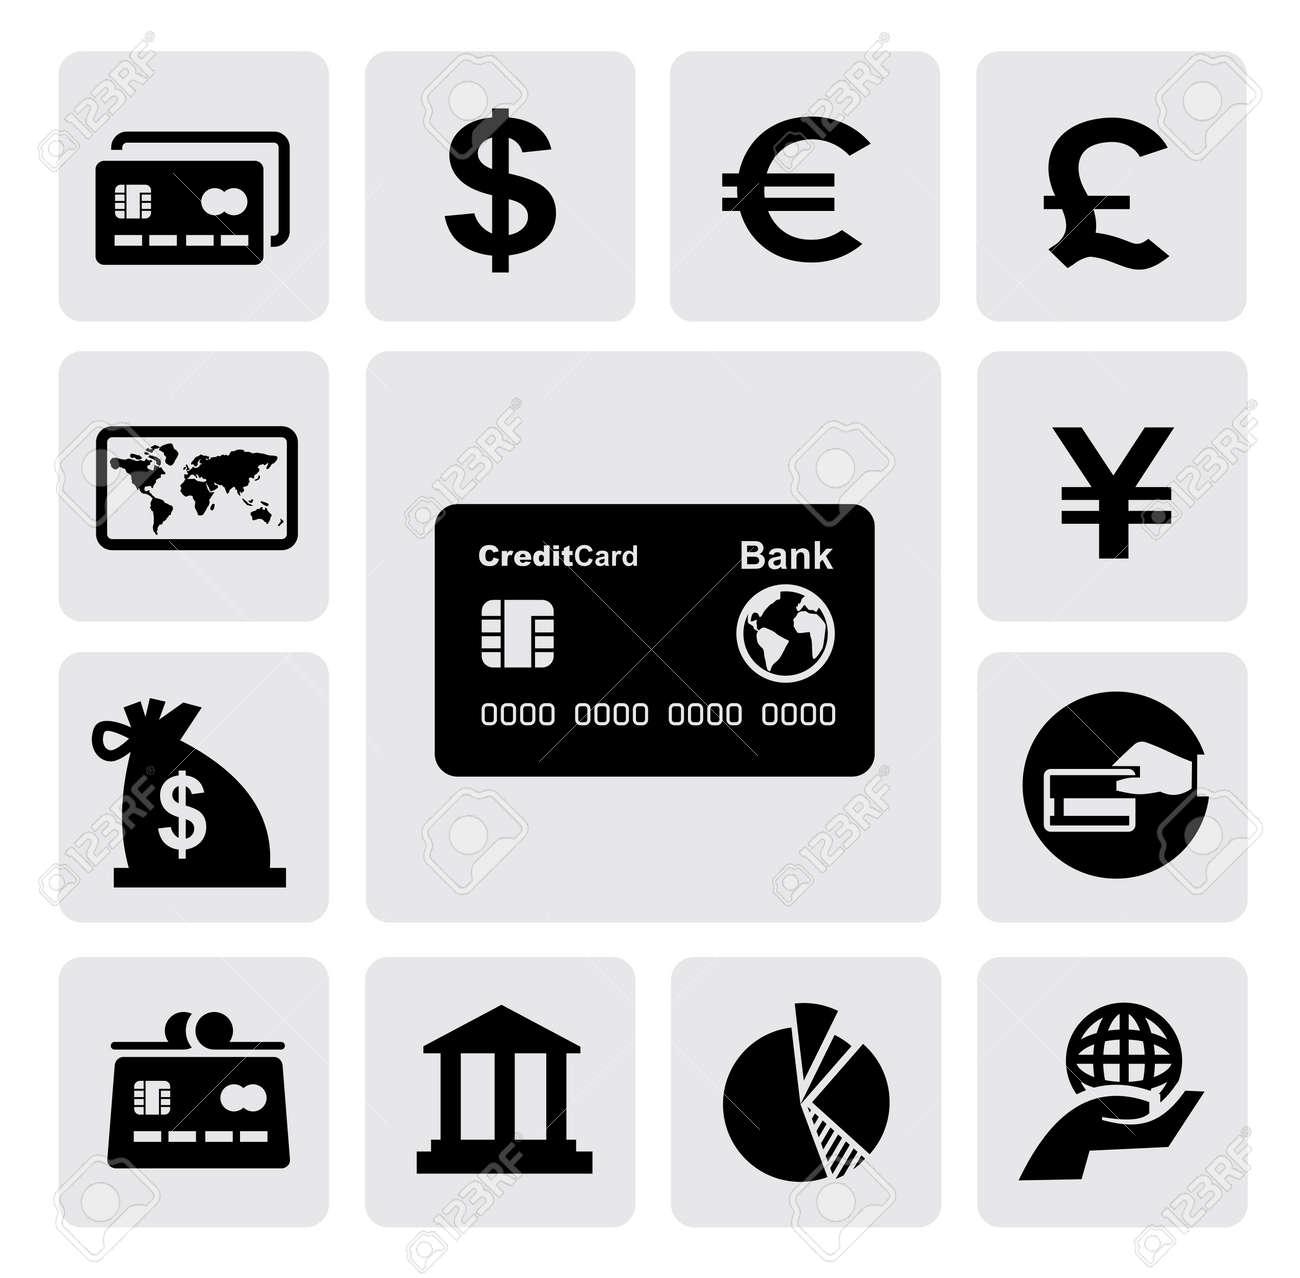 credit card Stock Vector - 17012227